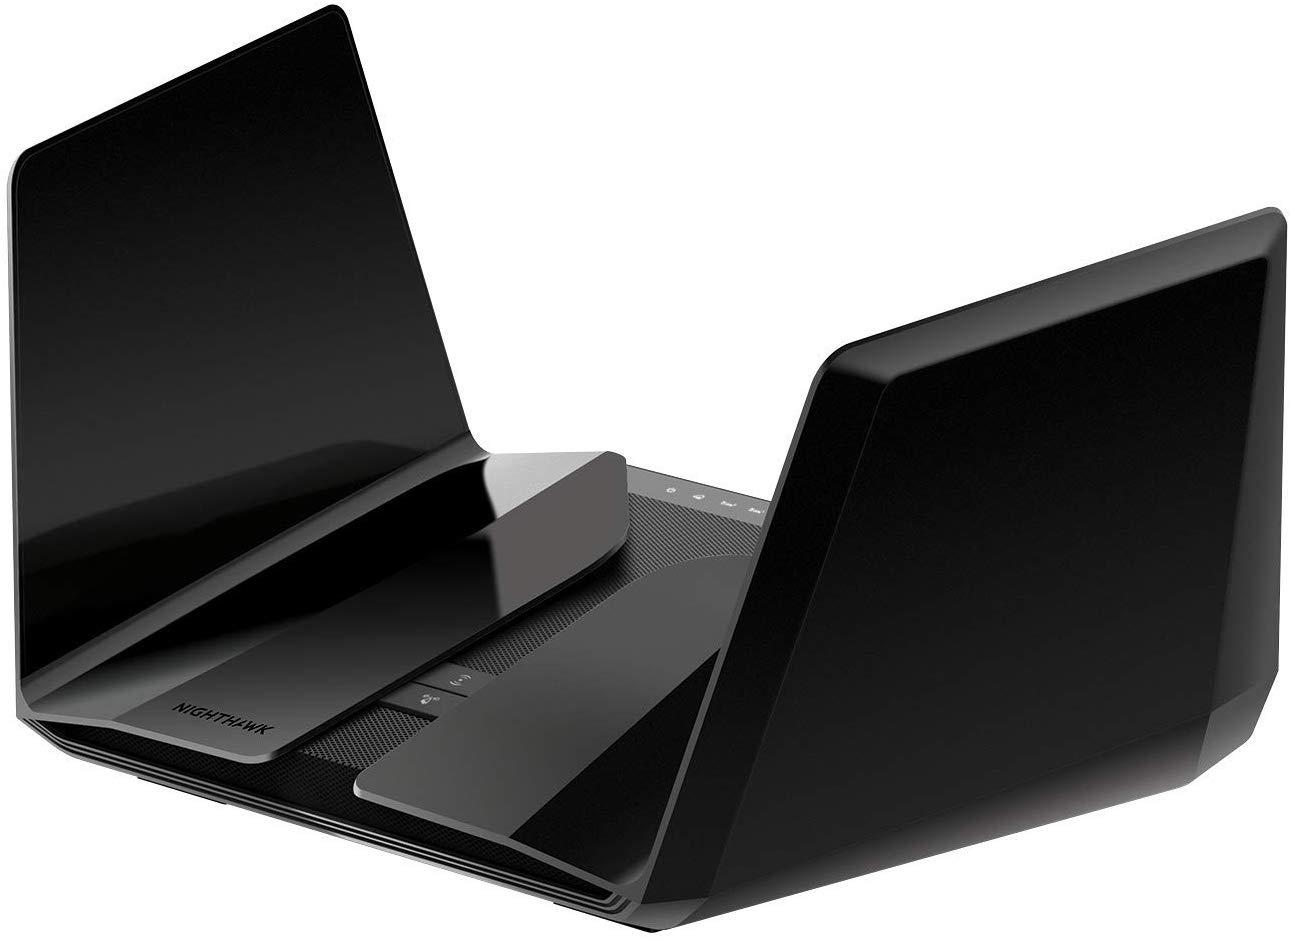 NETGEAR Nighthawk AX12 12-Stream Tri-Band Wi-Fi 6 Router £368.49 at Amazon